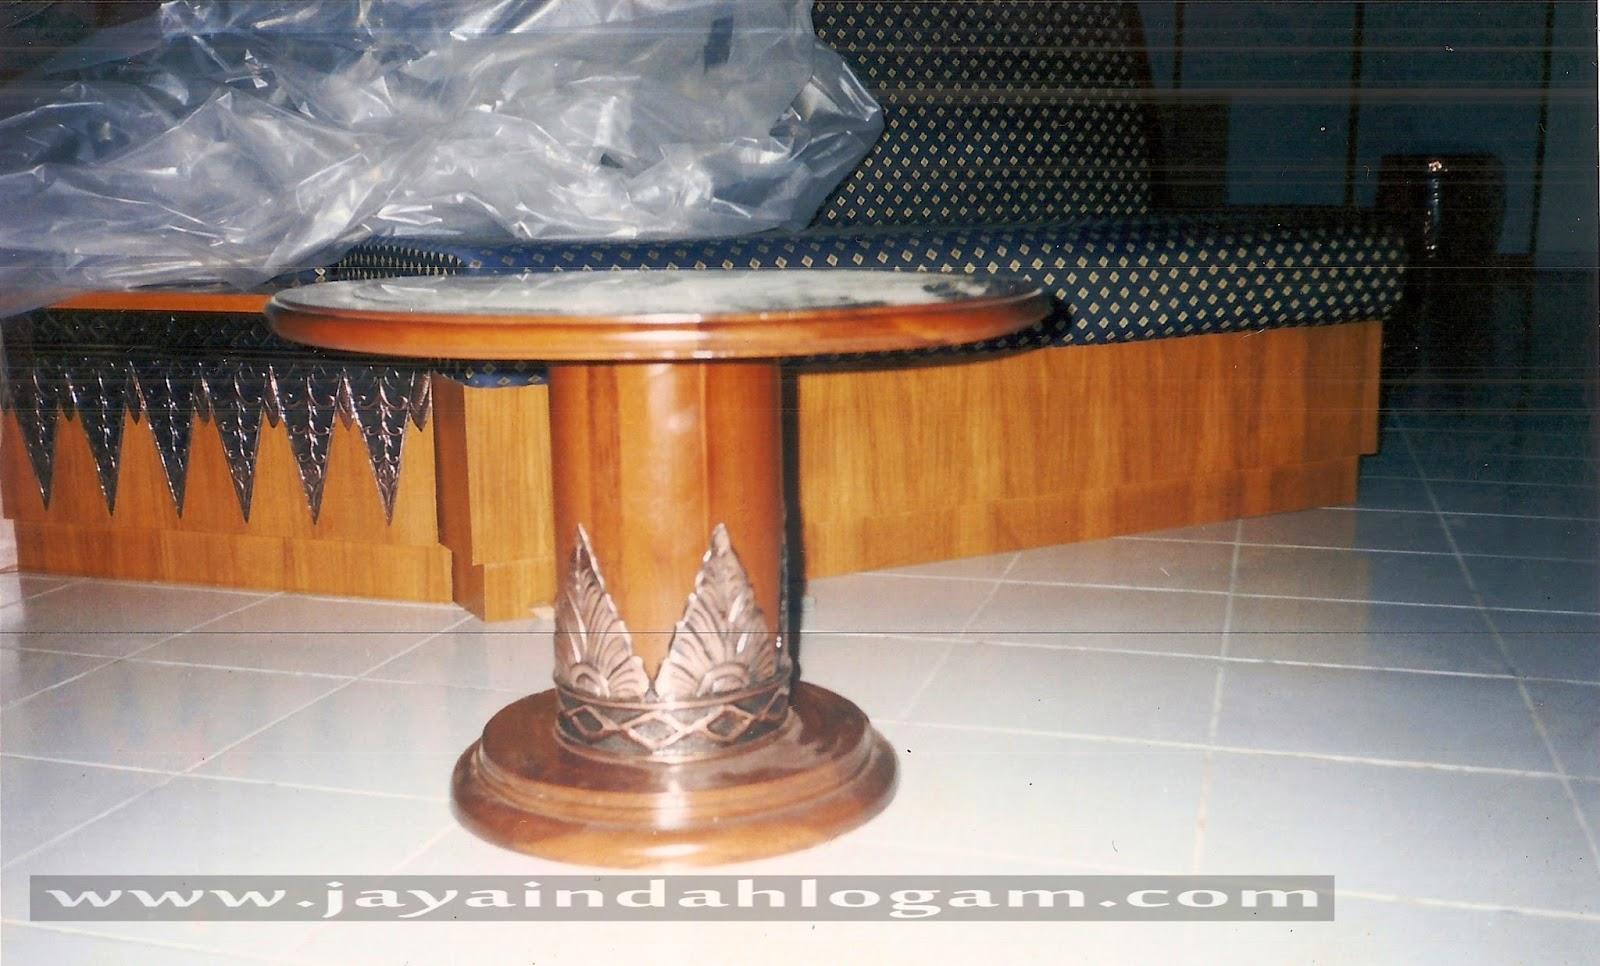 http://www.jayaindahlogam.com/2014/08/aksesories-tembaga.html